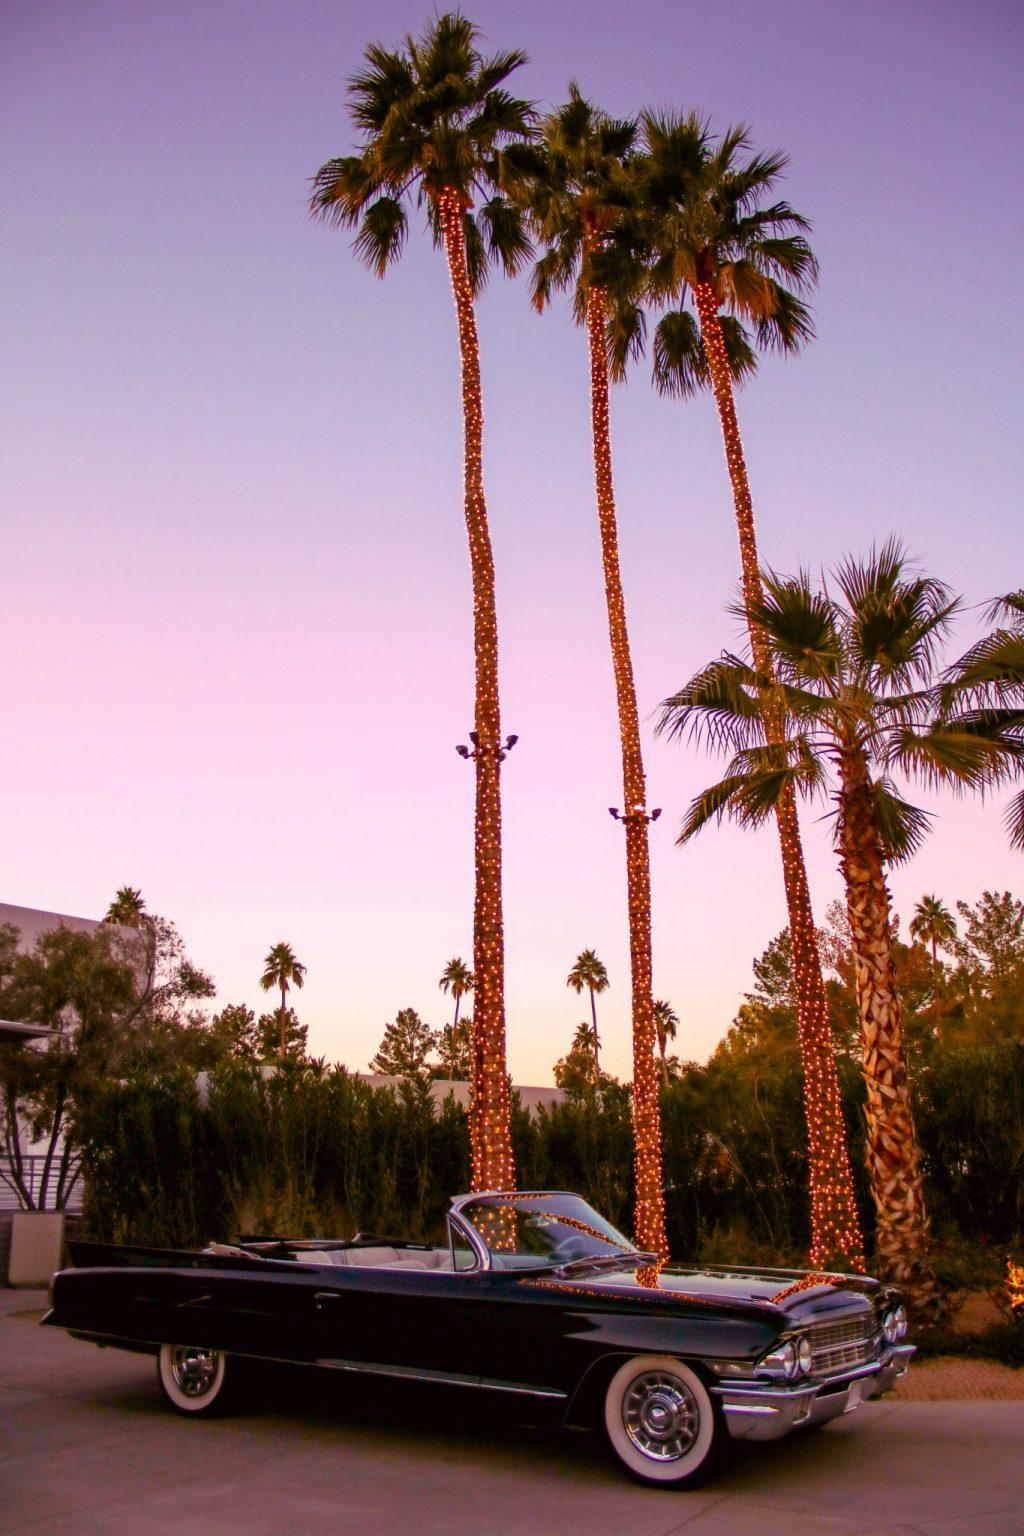 Hyatt Andaz Scottsdale: Your dessert luxury stay awaits